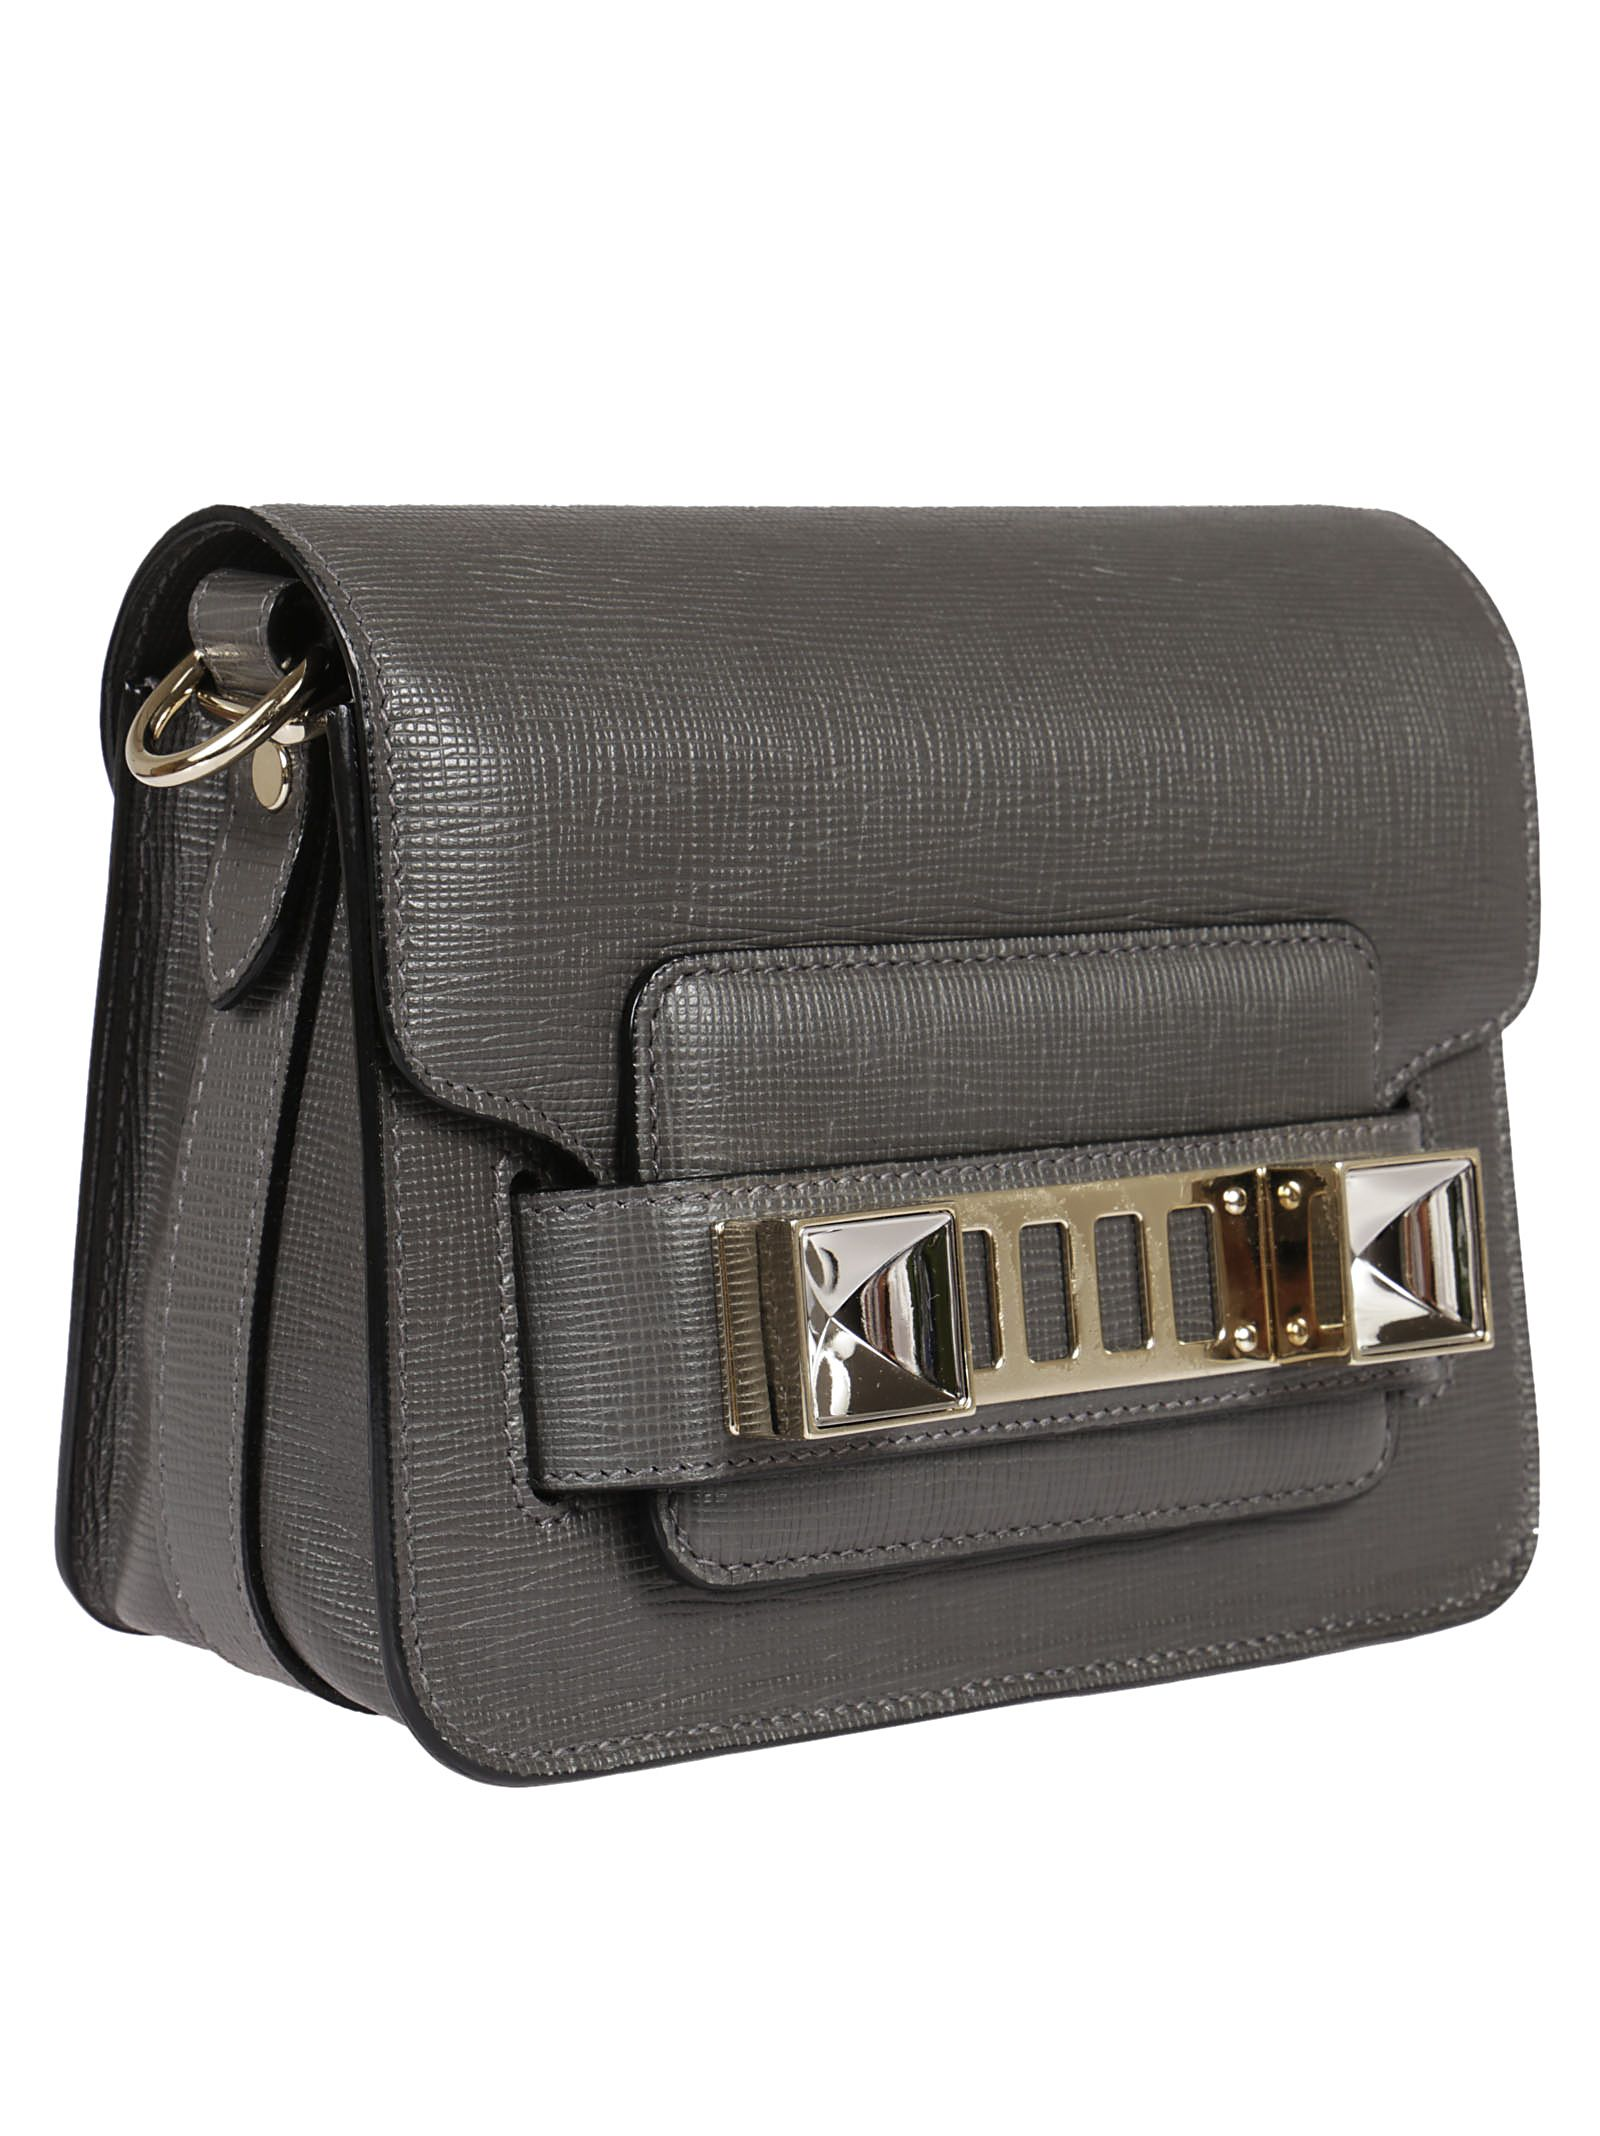 proenza schouler bag proenza schouler ps11 tiny shoulder bag proenza schouler ps11 tiny shoulder  bag ... KYNLQMN